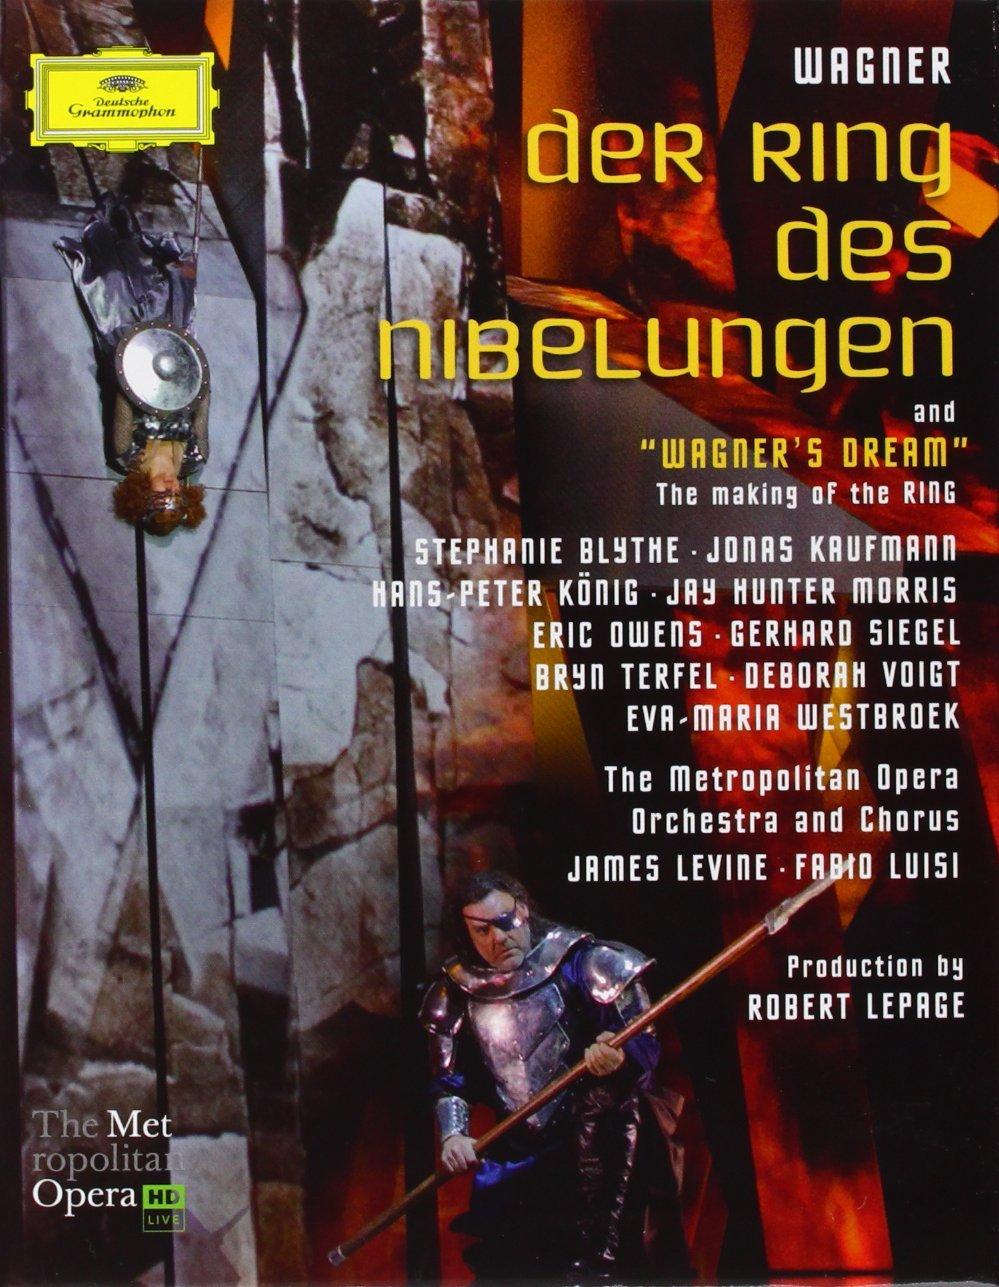 2012 - Wagner:Der Ring des Nibelungen(Levine, Luisi cond.)